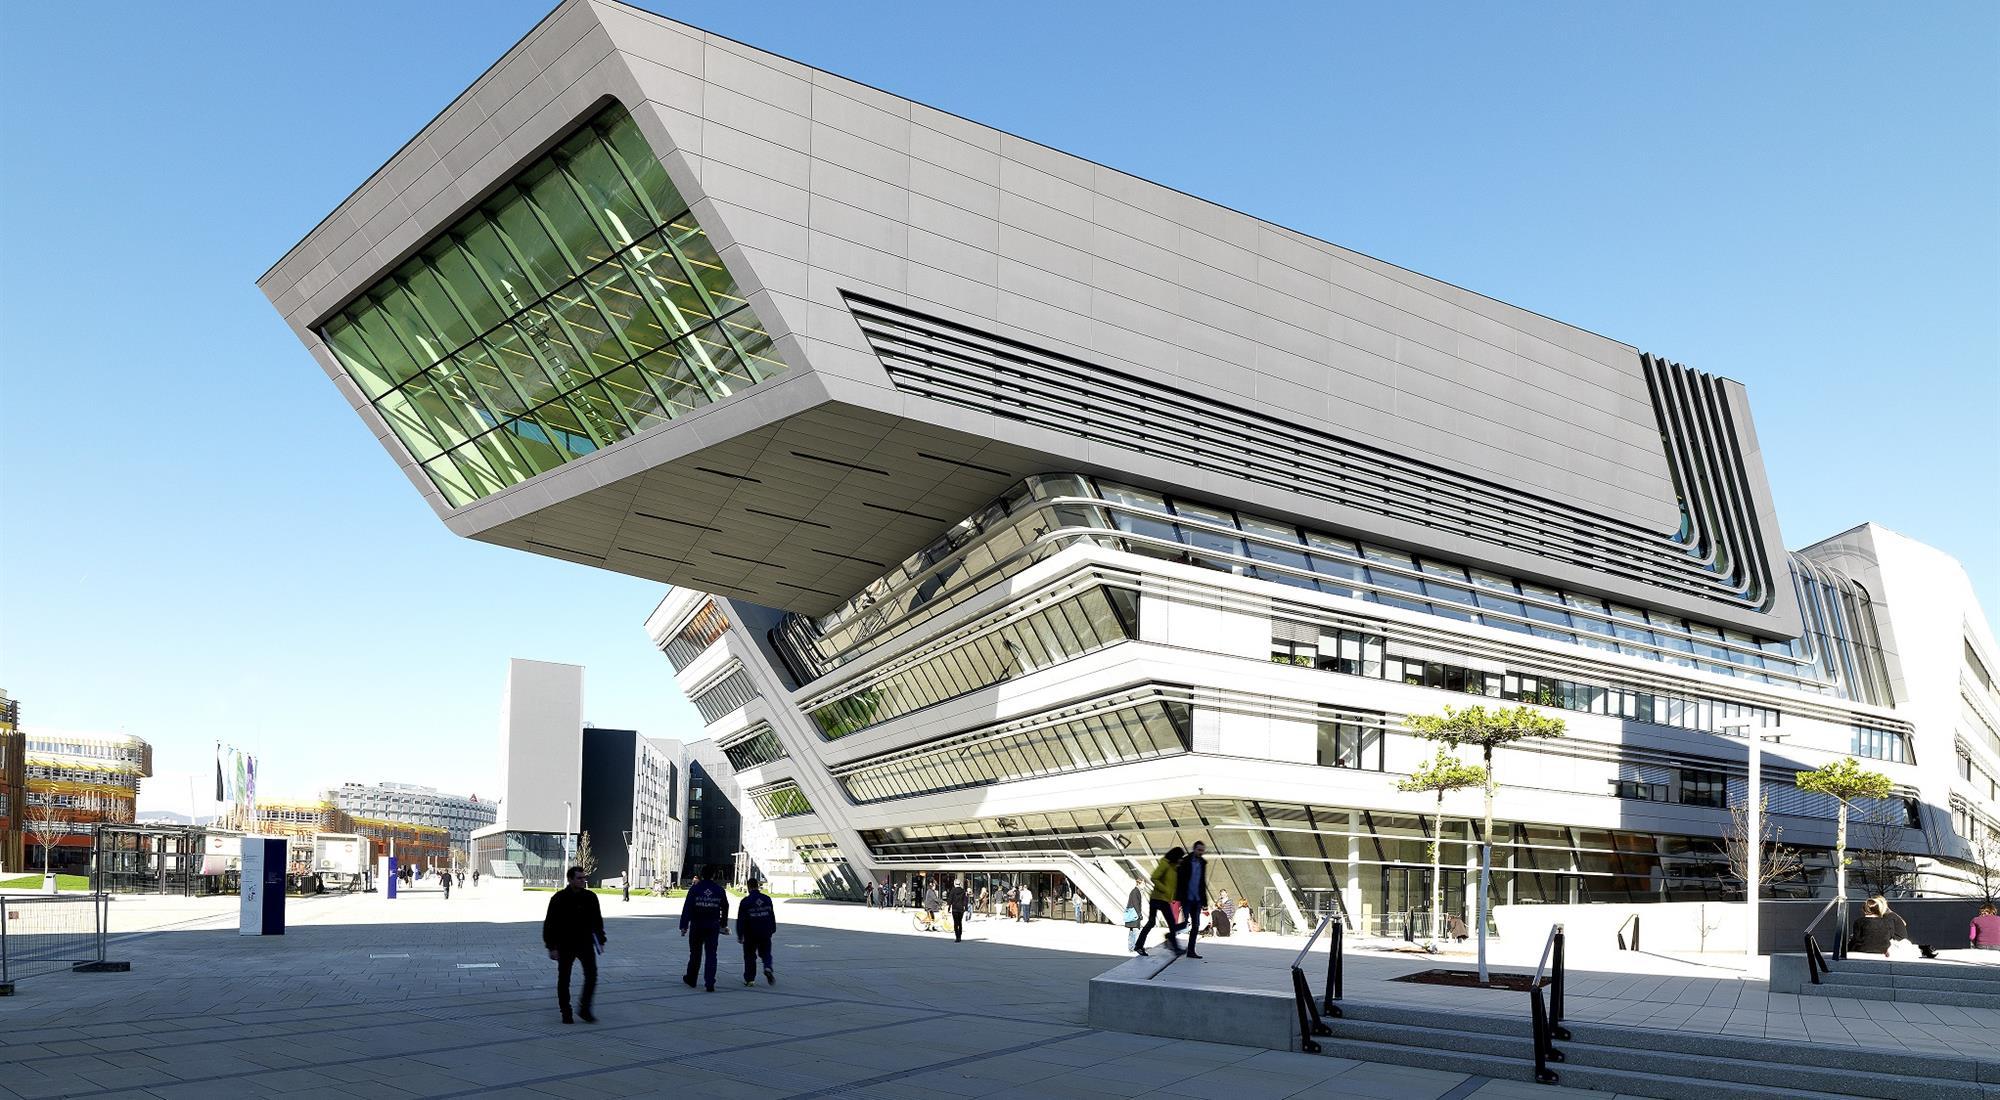 WU Viena University of Economics and Business